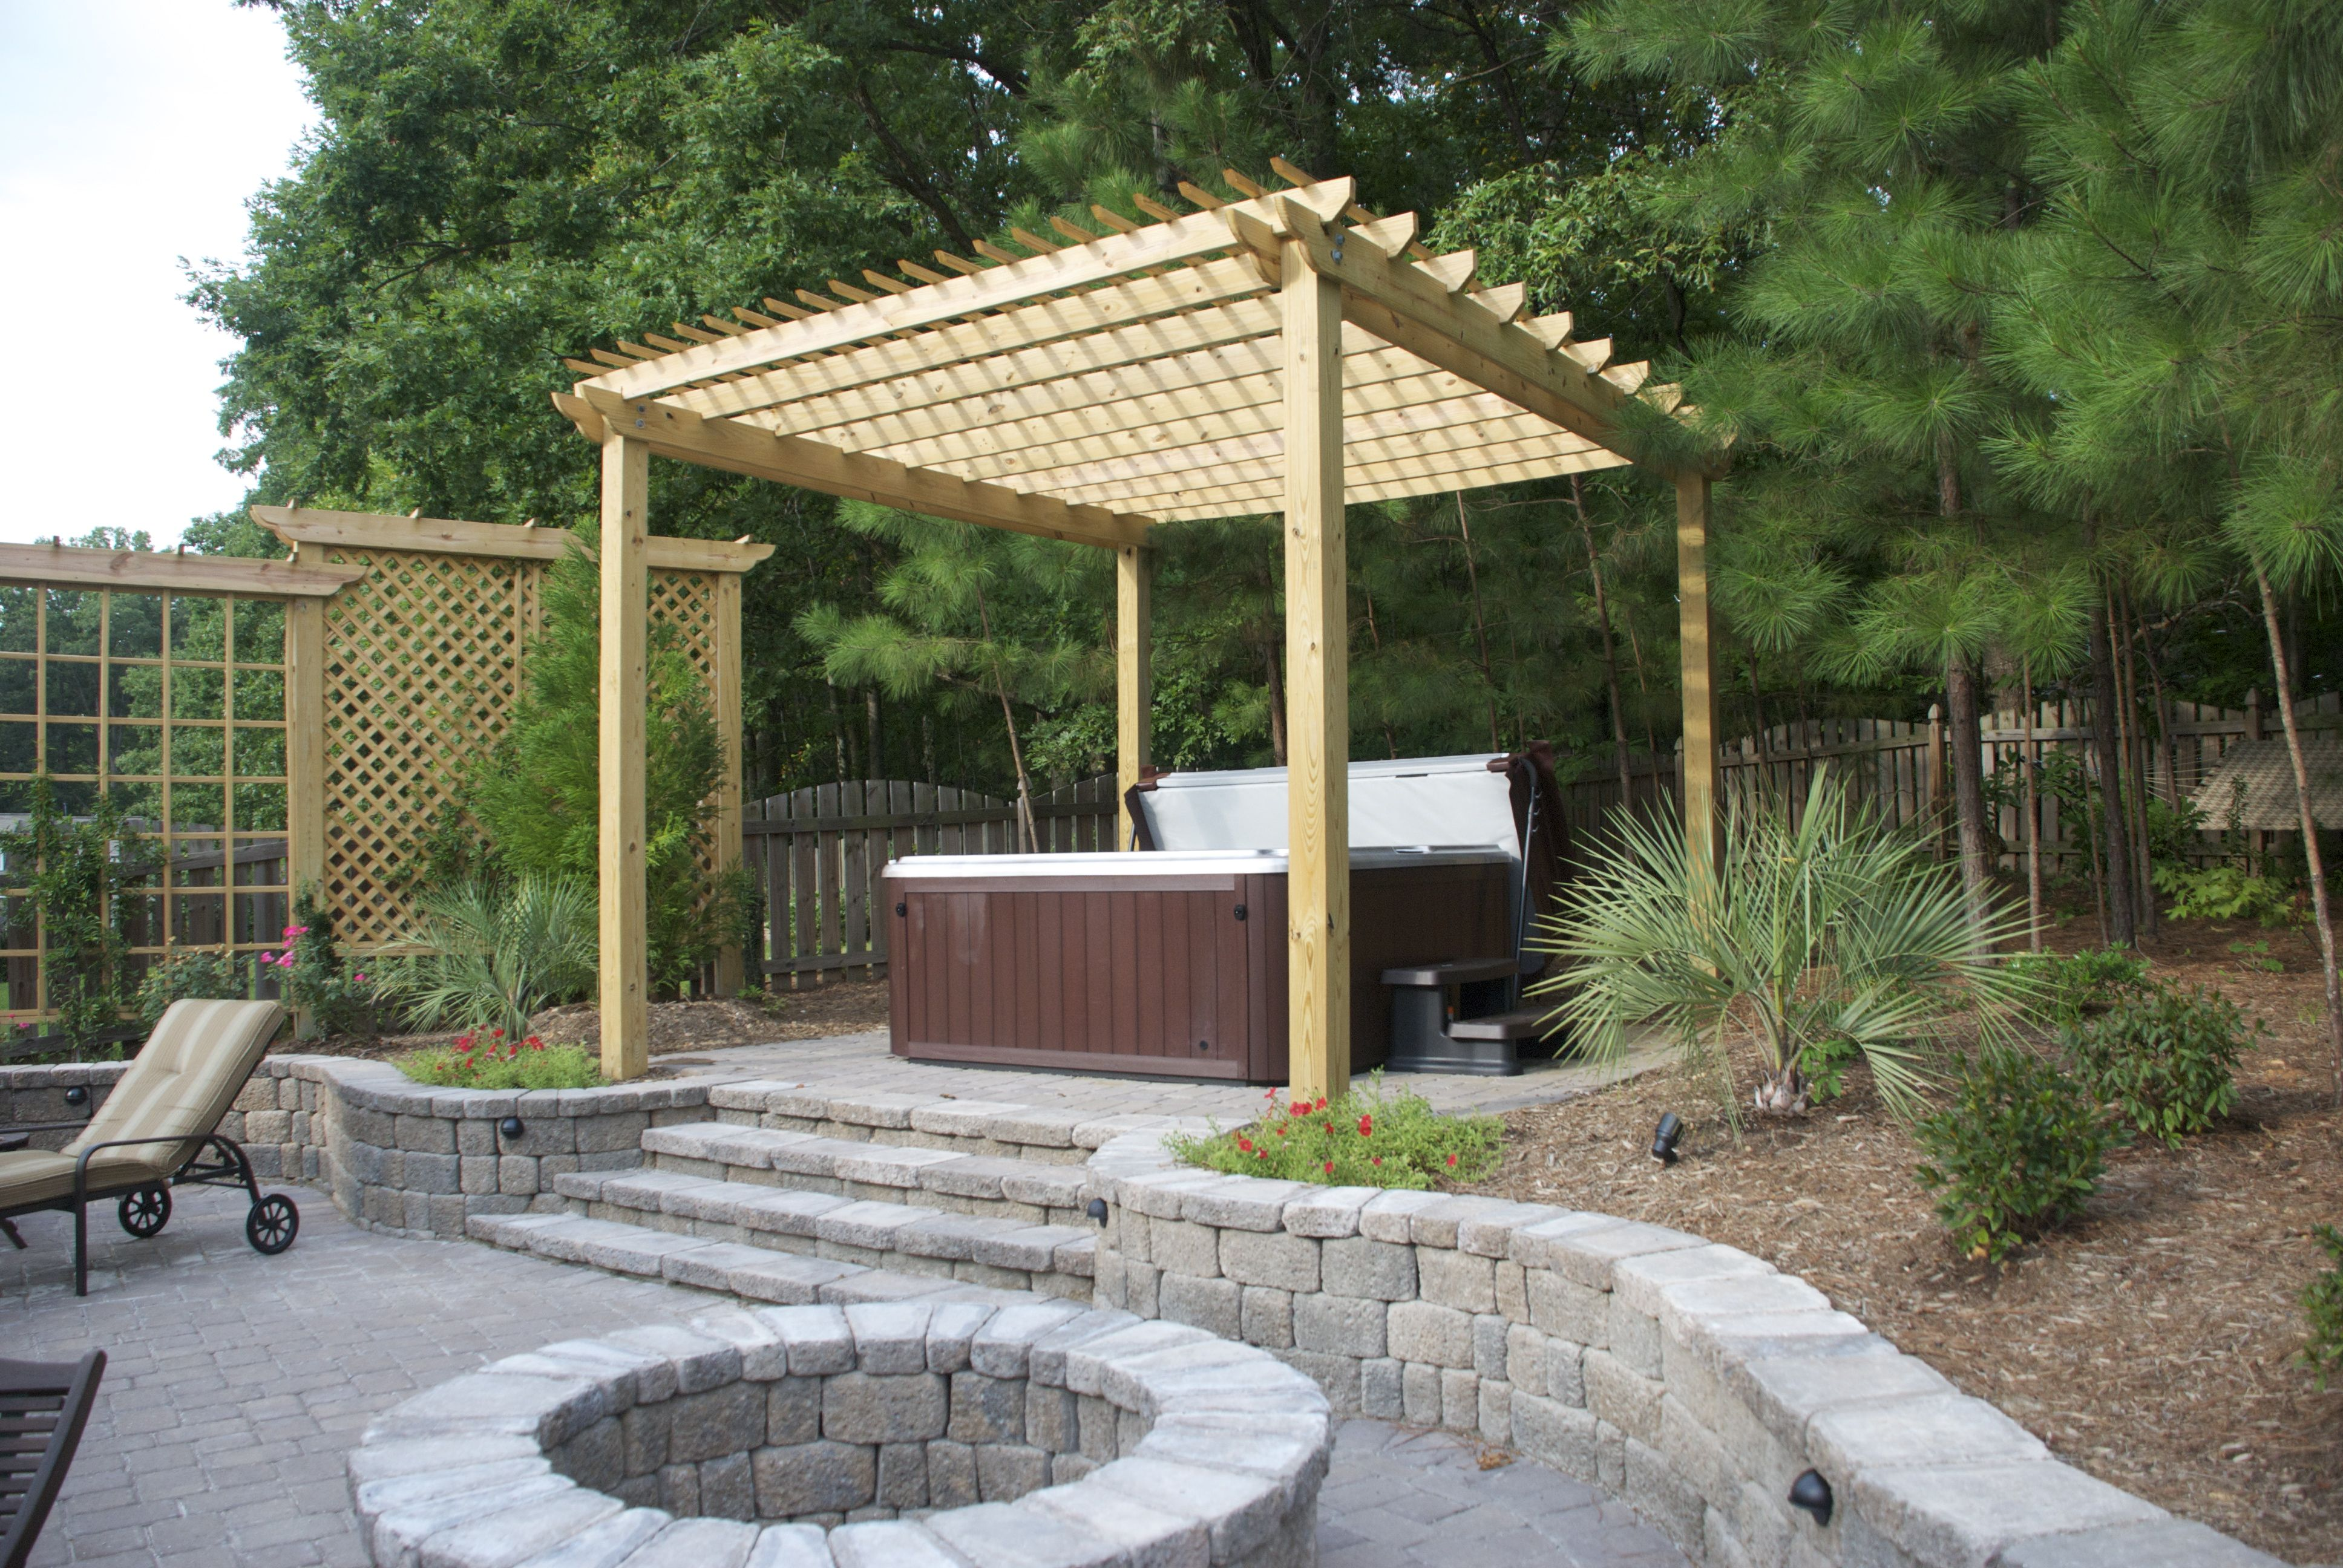 Sundance Chelsee hot tub, spa installations, backyard